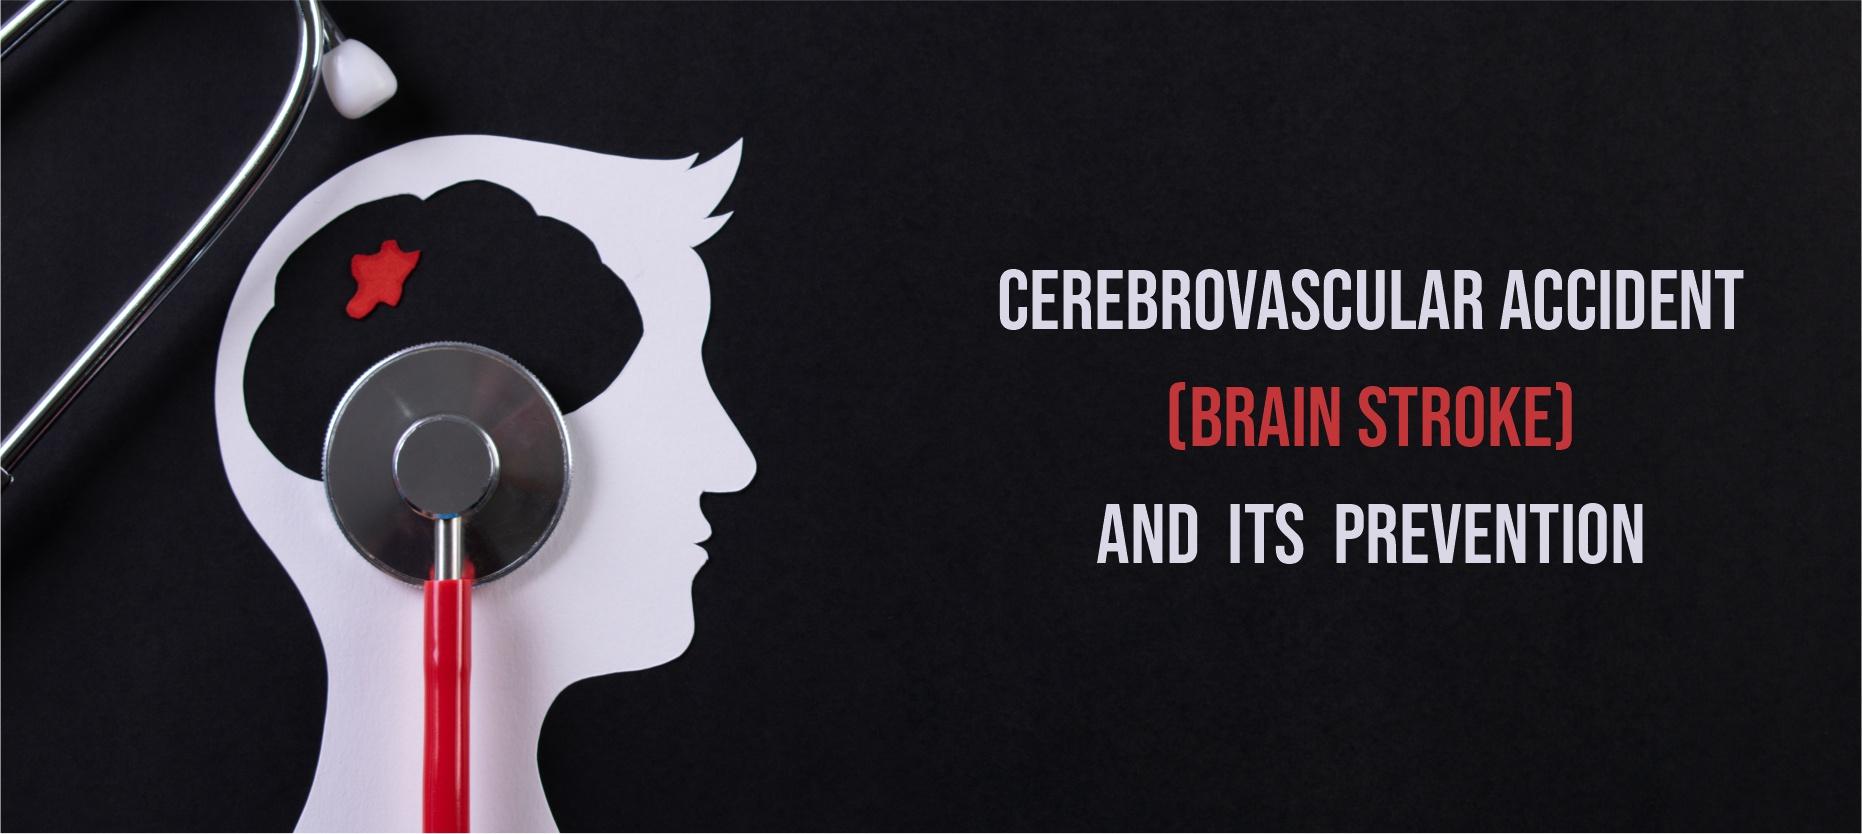 Cerebrovascular Accident (Brain Stroke) and its prevention